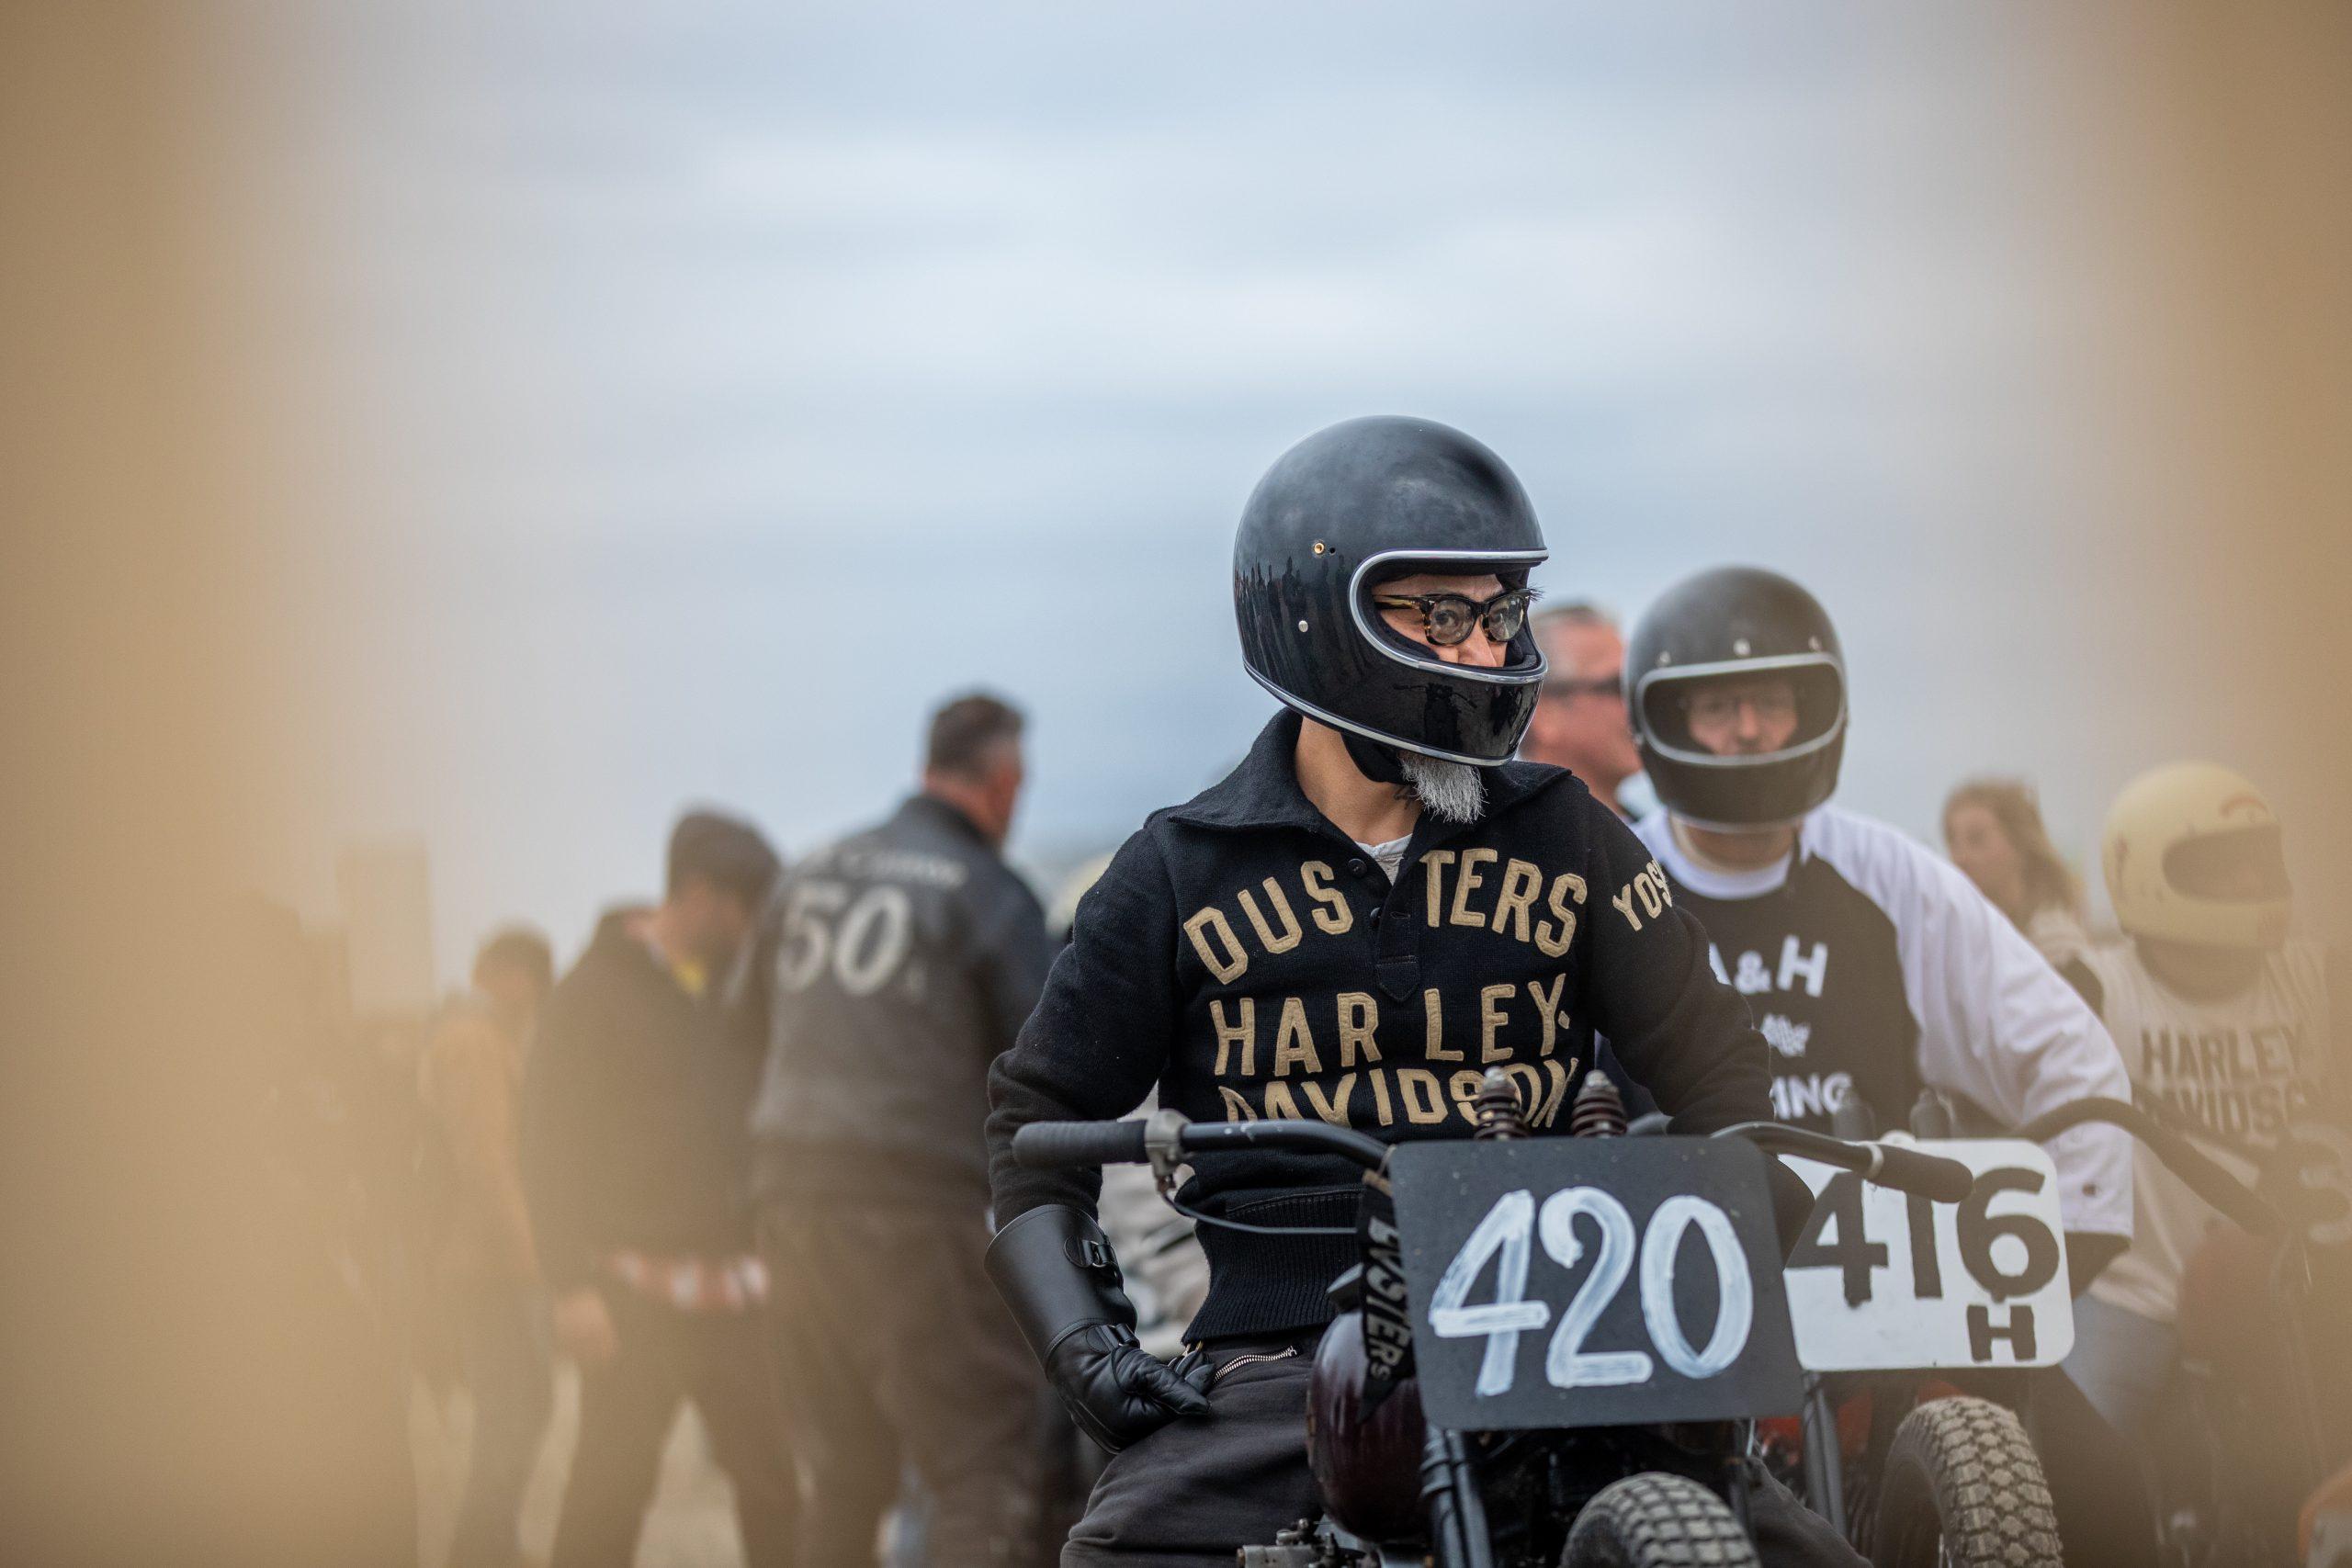 motorbike beach drag racer